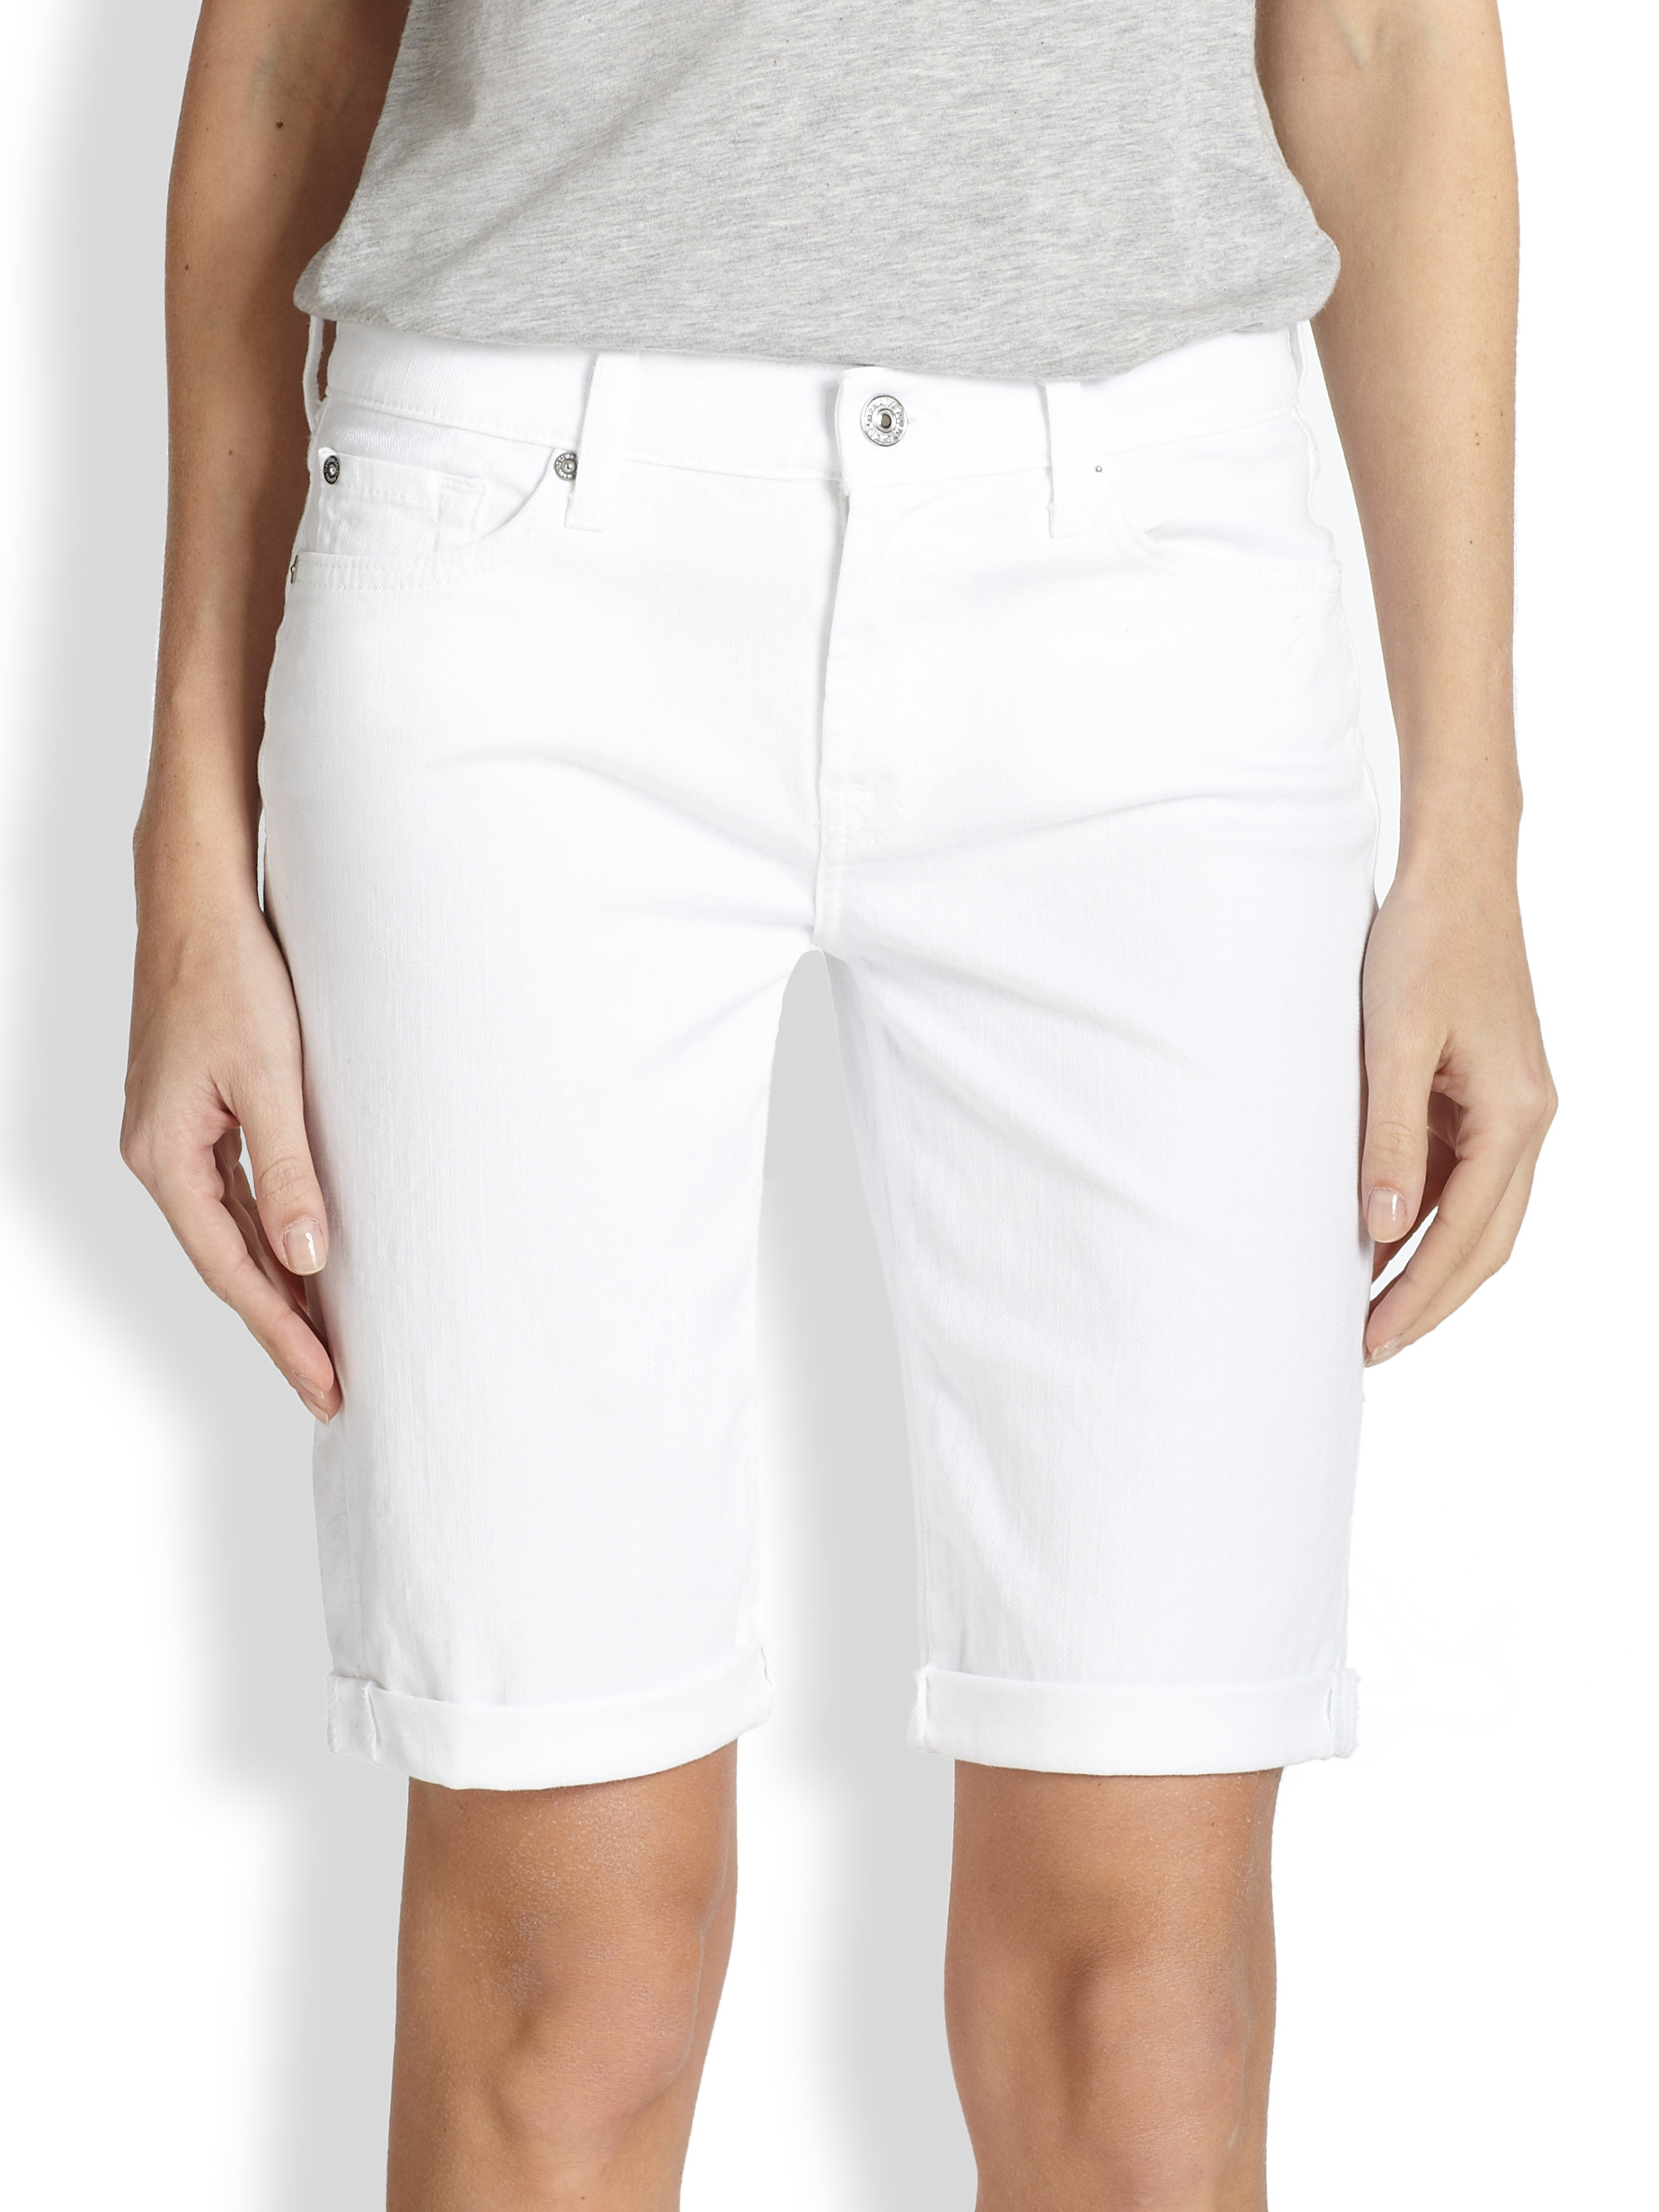 7 for all mankind Stretch Denim Bermuda Shorts in White | Lyst